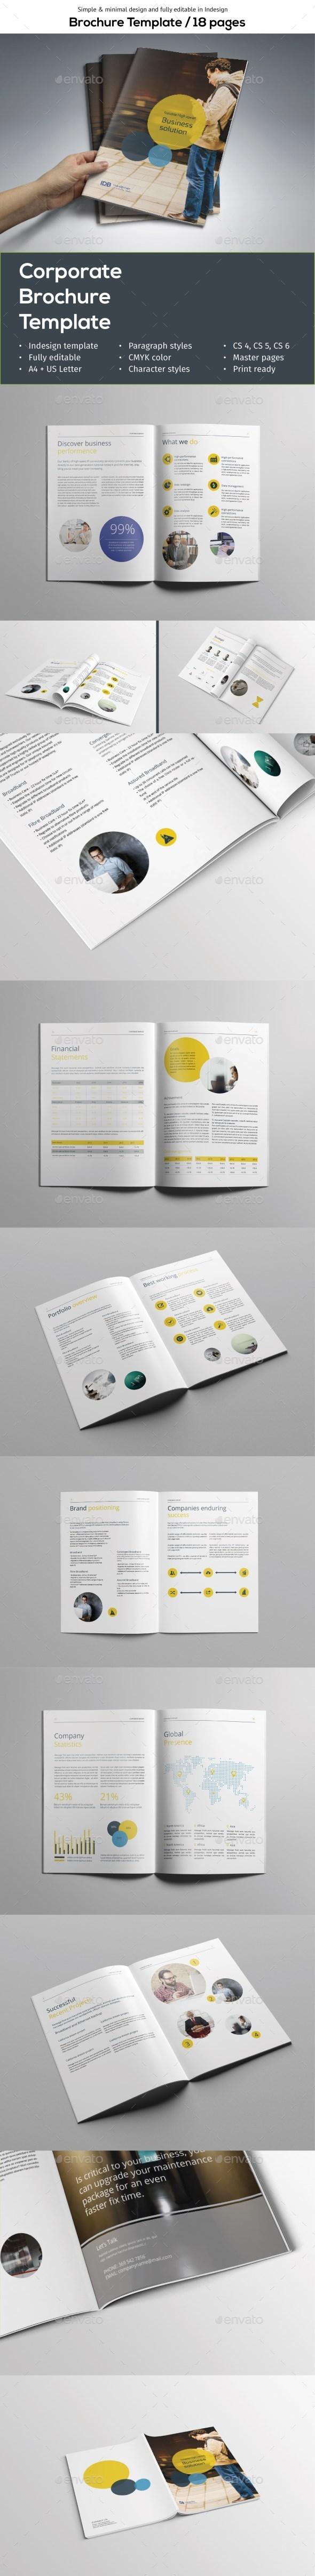 Simple Brochure Template - Corporate Brochures